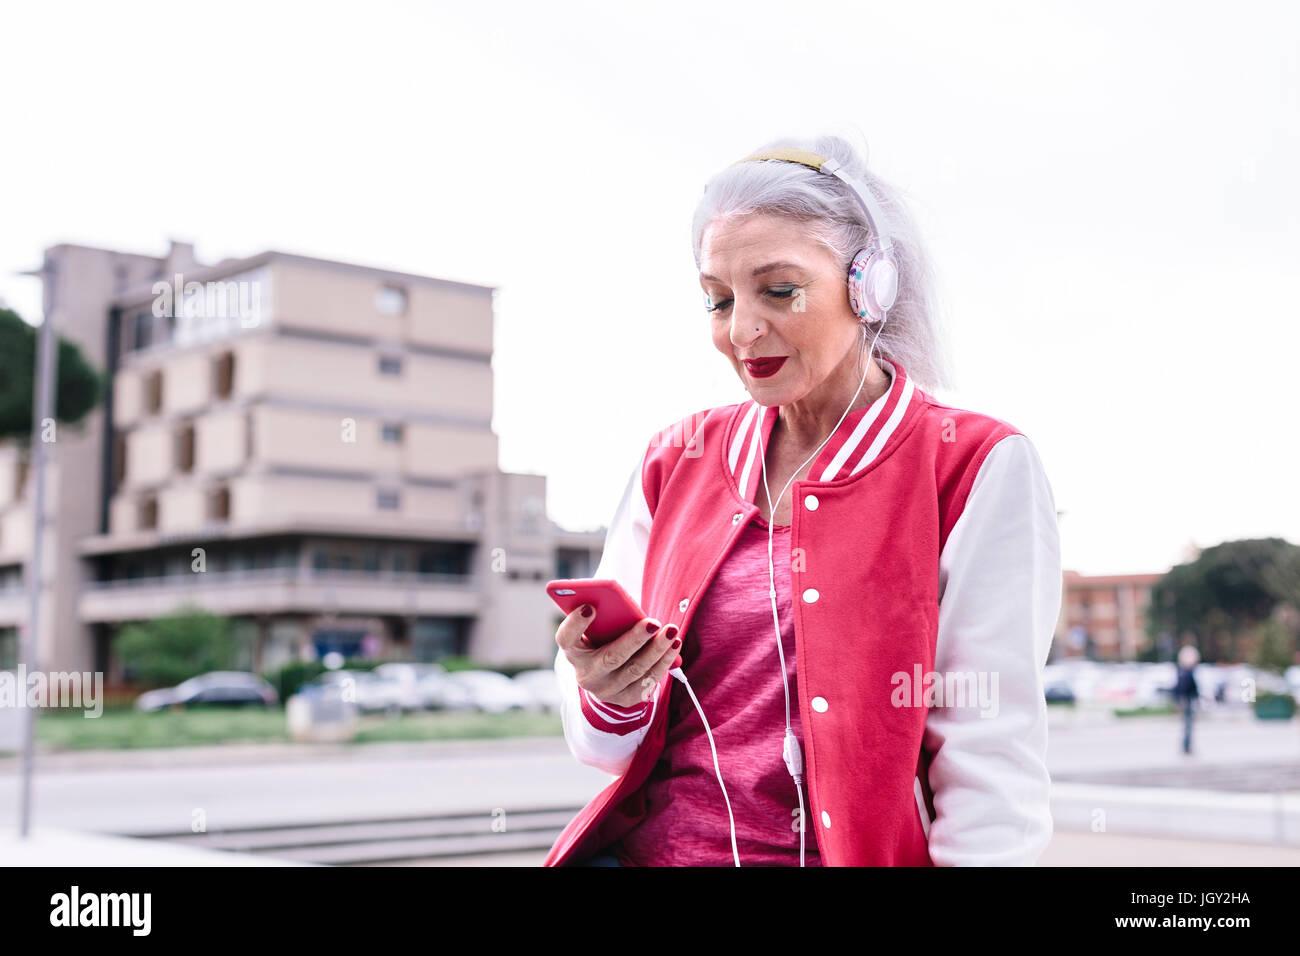 Reife Frau in Baseballjacke Kopfhörer anhören und mit Blick auf smartphone Stockbild